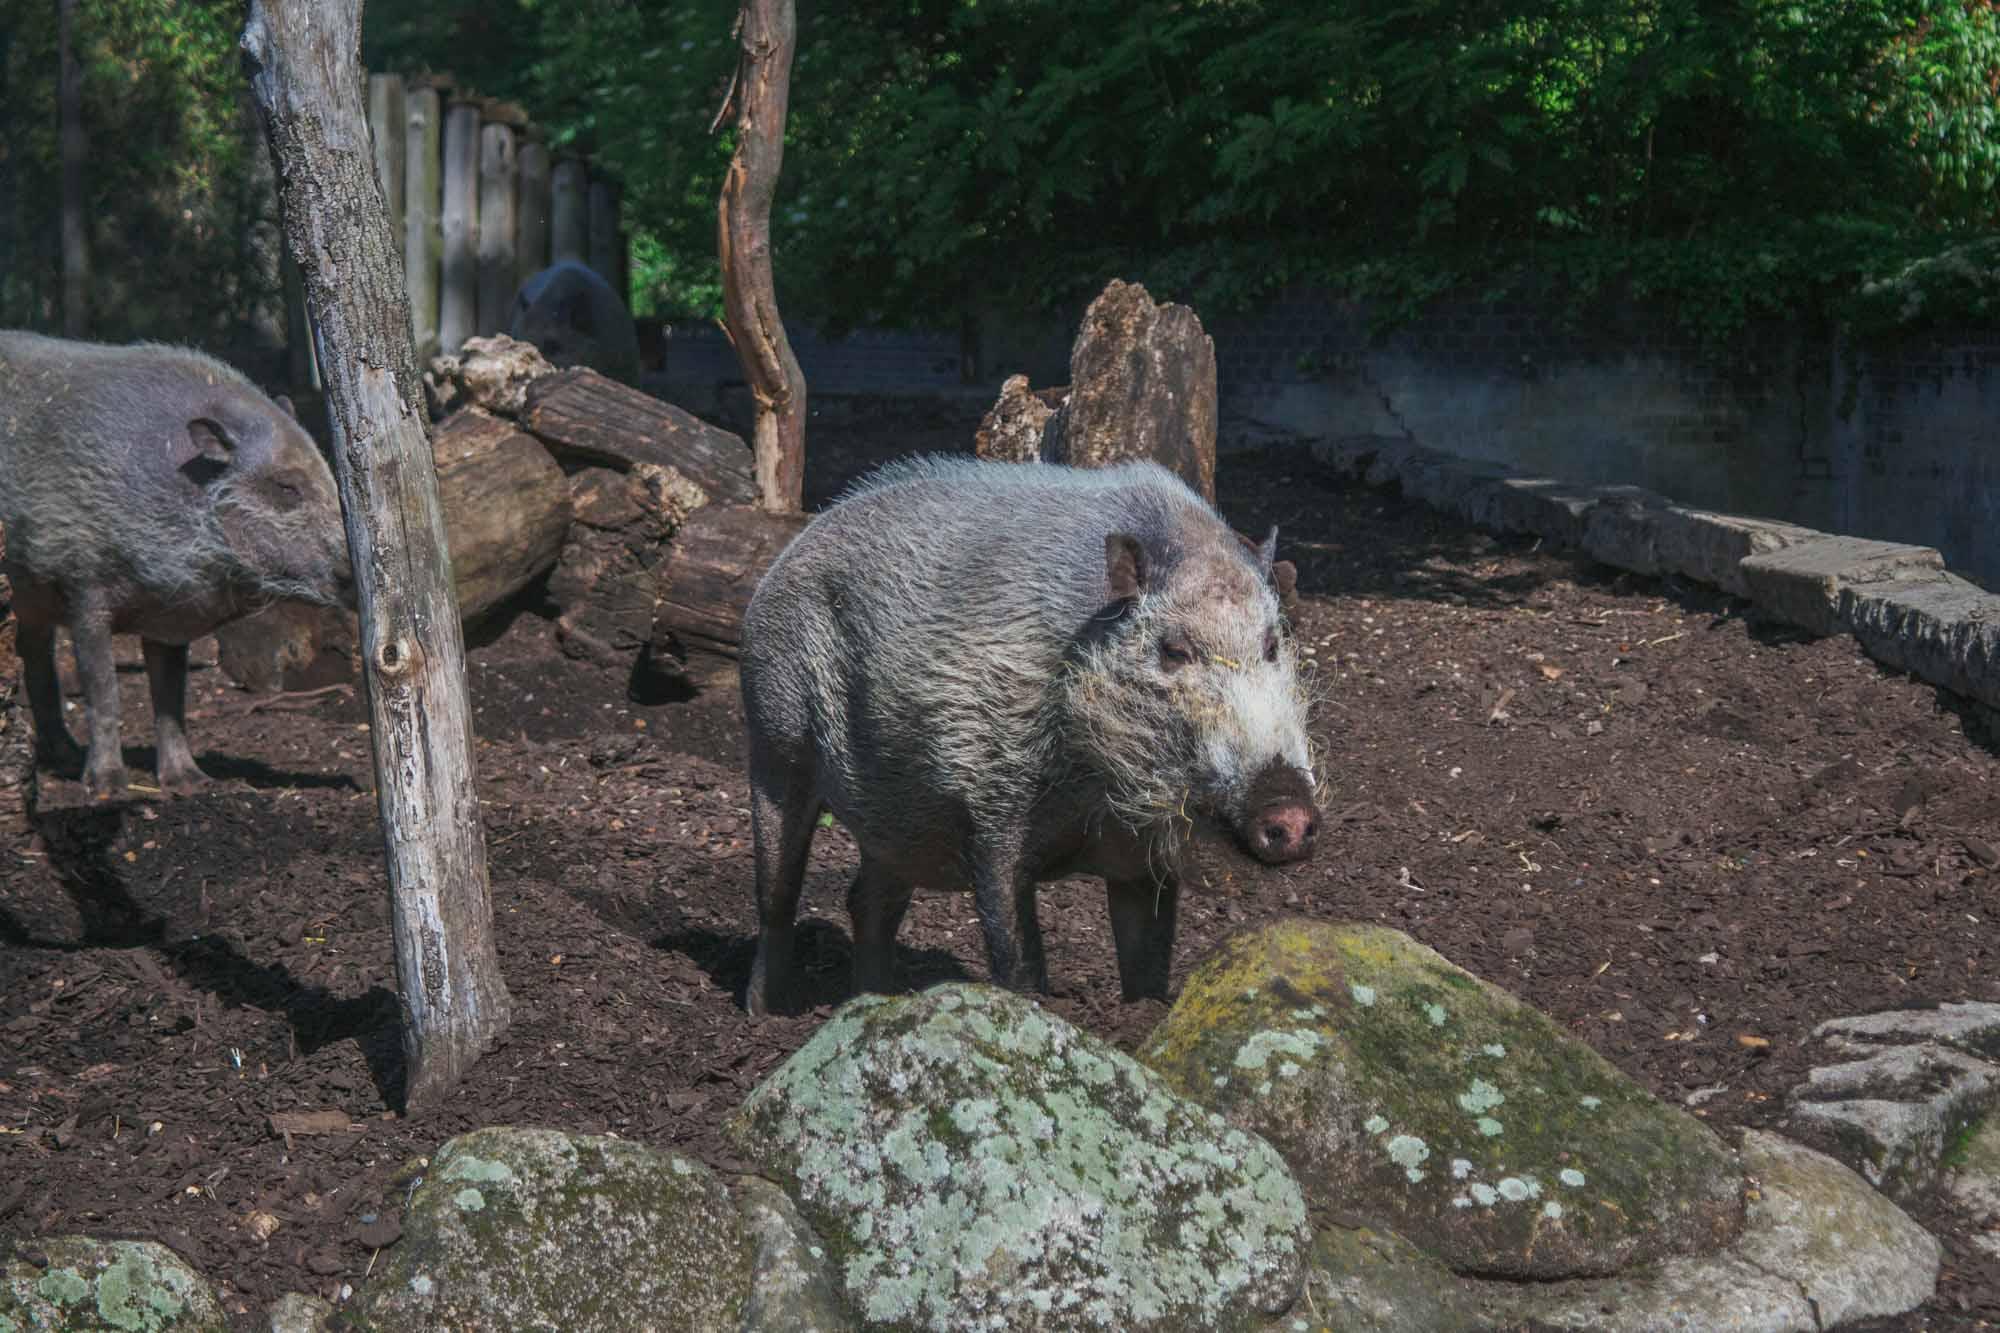 London Zoo ZSL - Bearded Pig